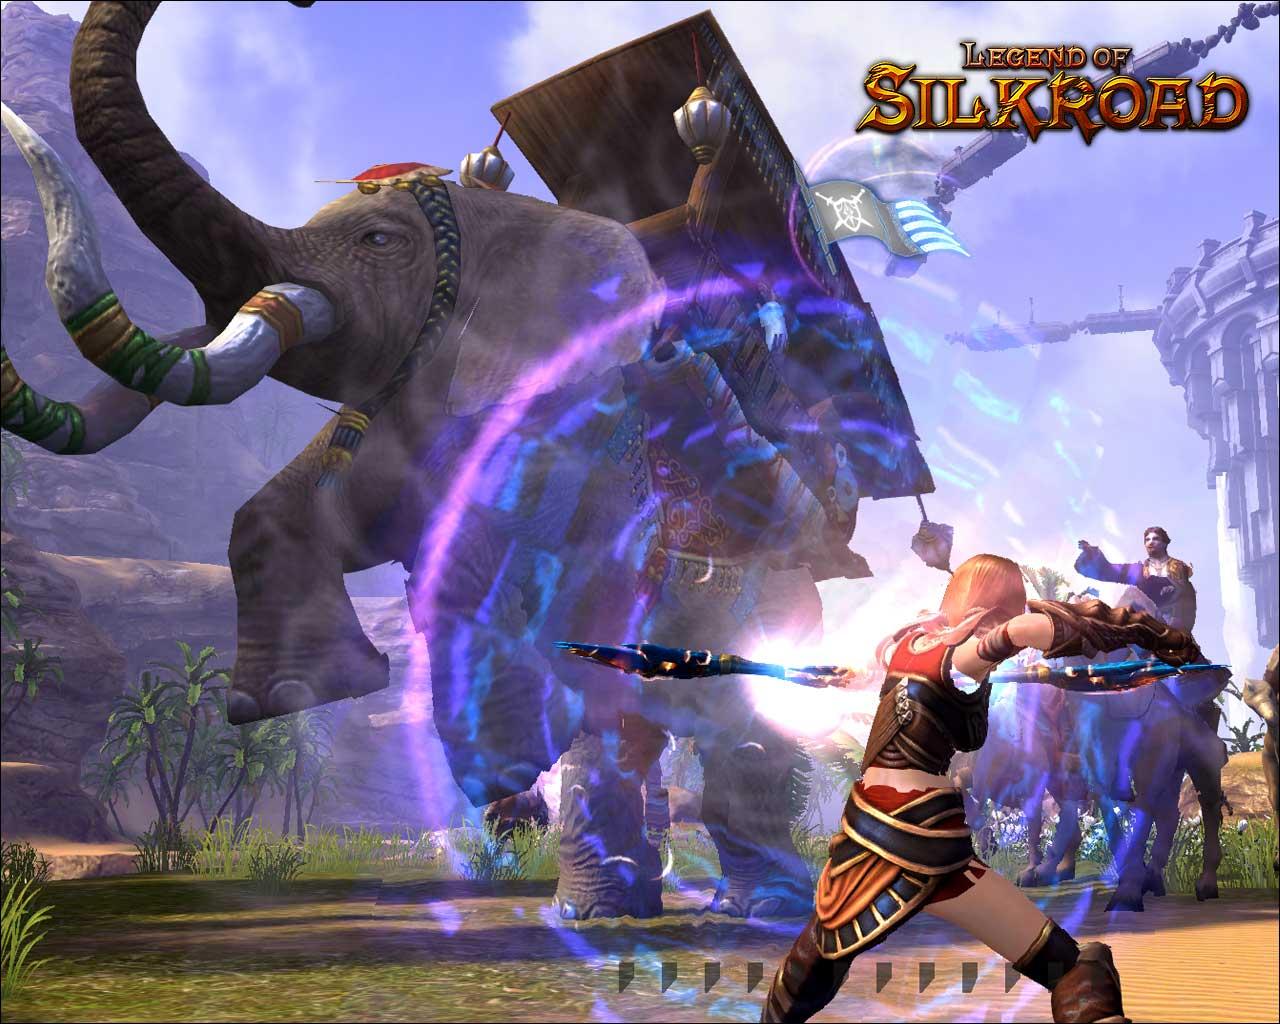 Legend-of-Silkroad-screenshot-2